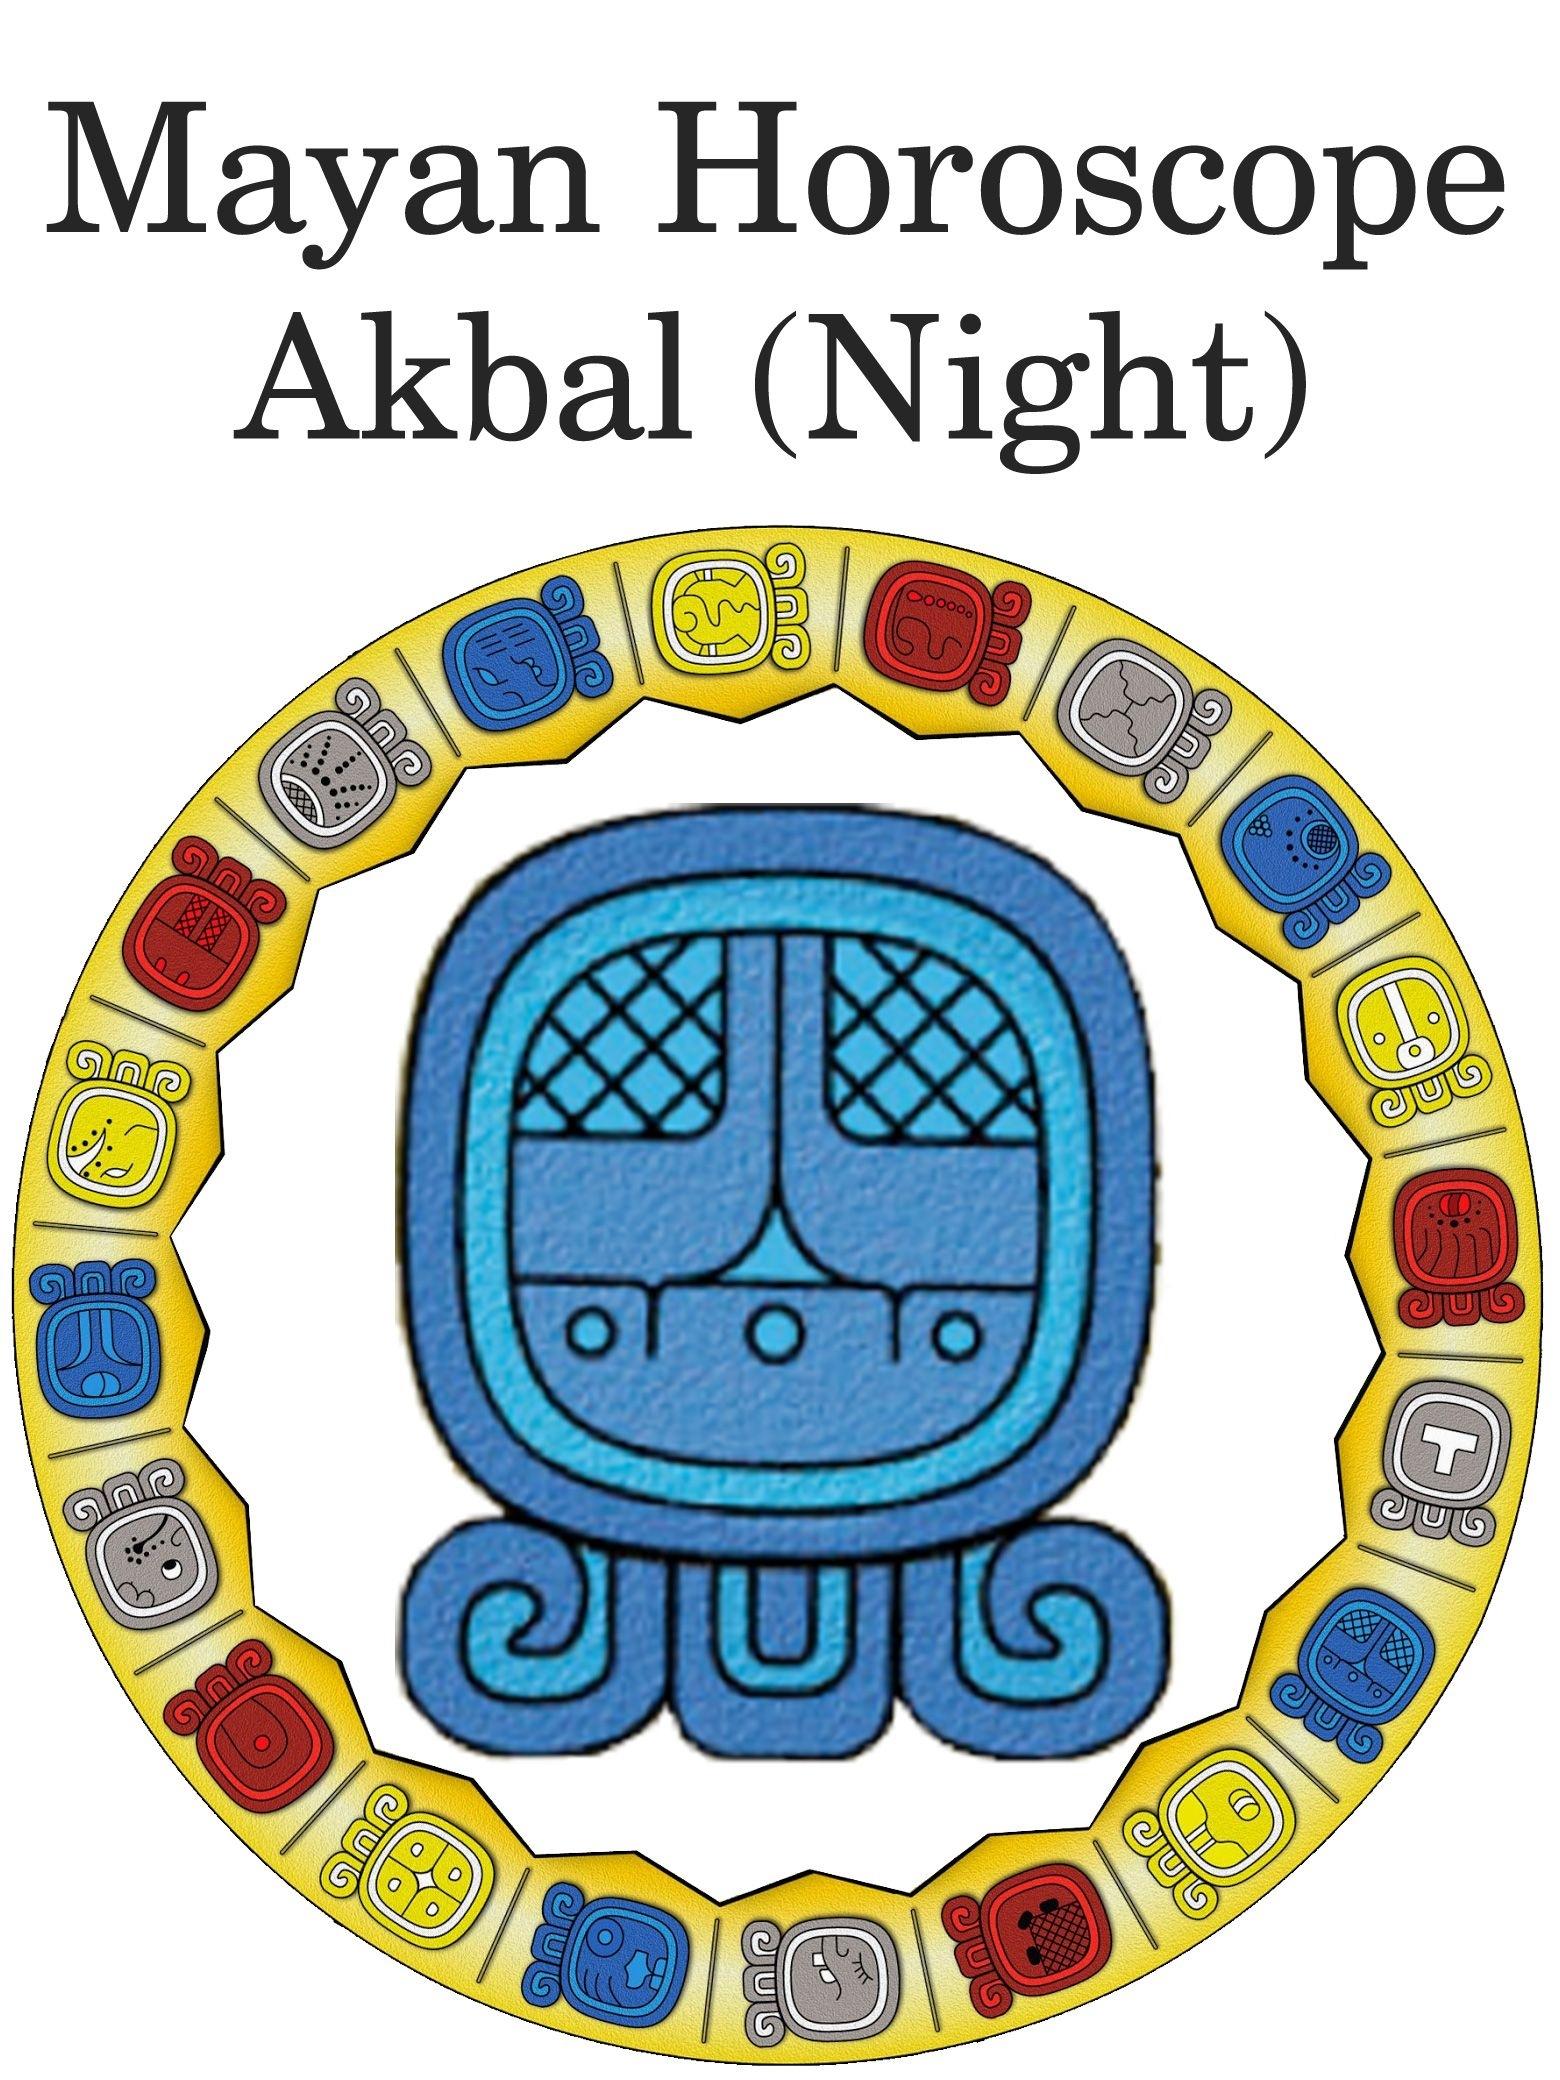 Akbal (Night) – Mayan Horoscope (Con Imágenes) | Zodiaco